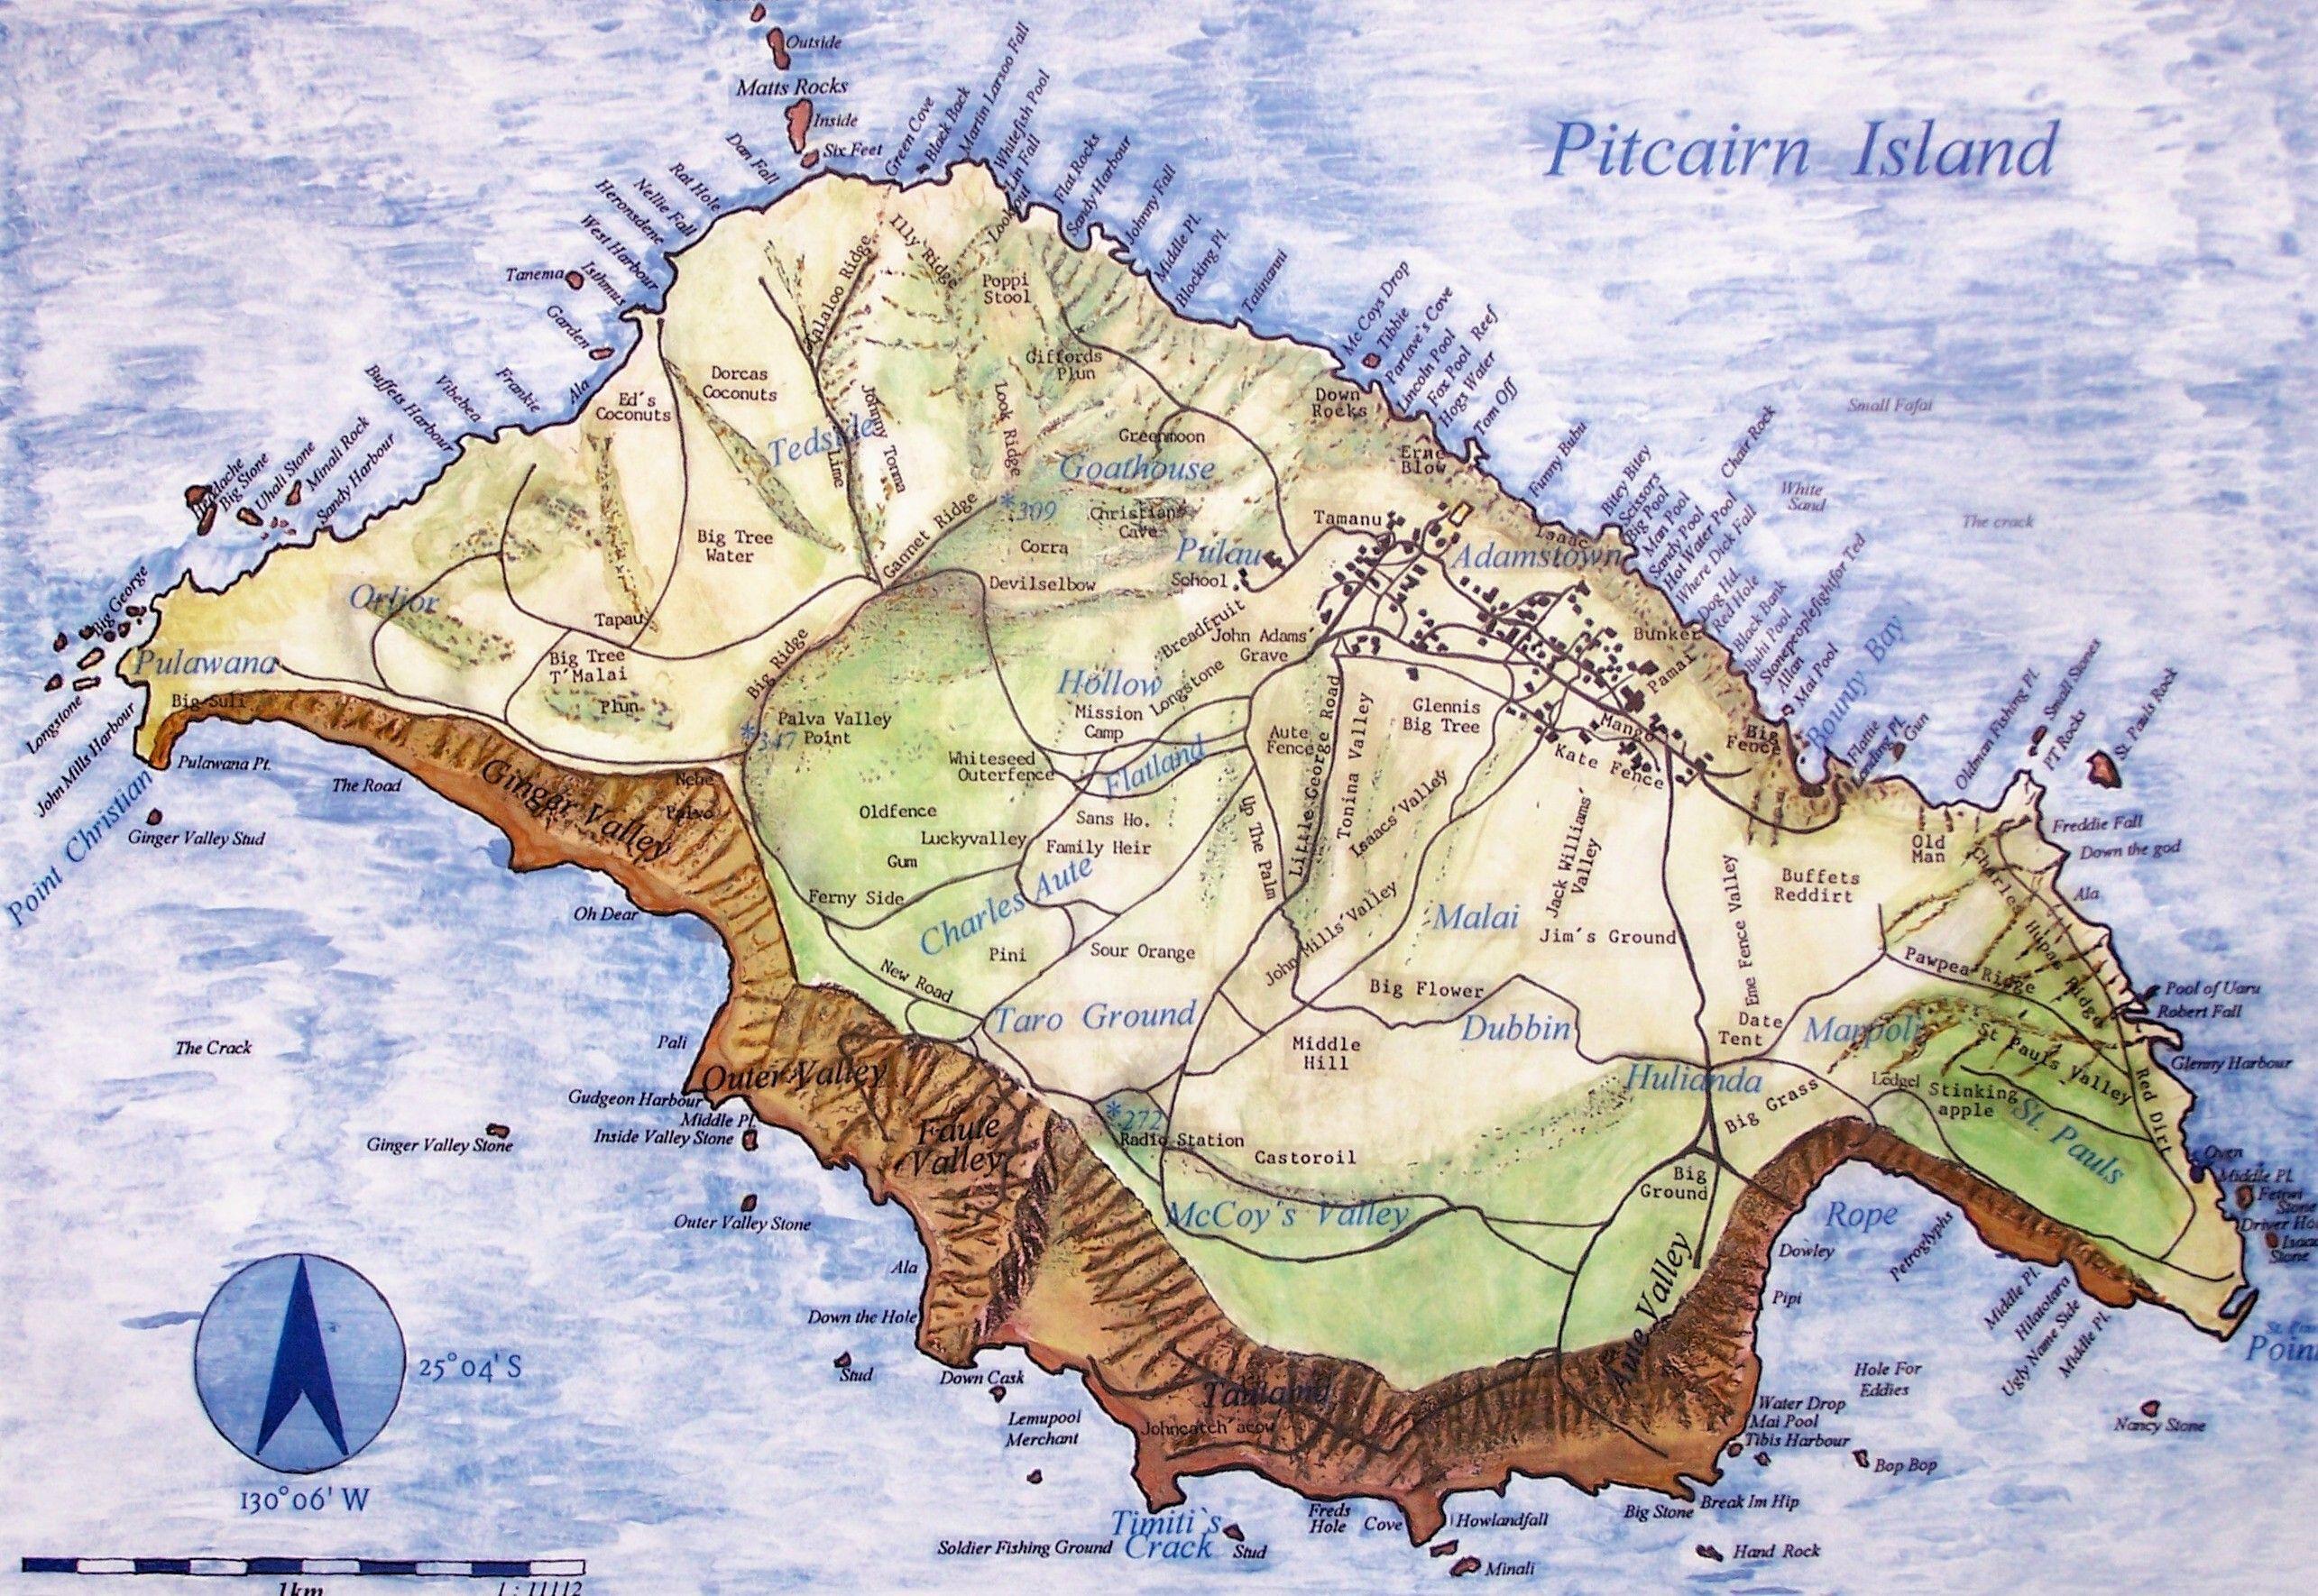 Pitcairn Island Map Pitcairn Mappery Pitcairn Islands Pitcairn Island Map